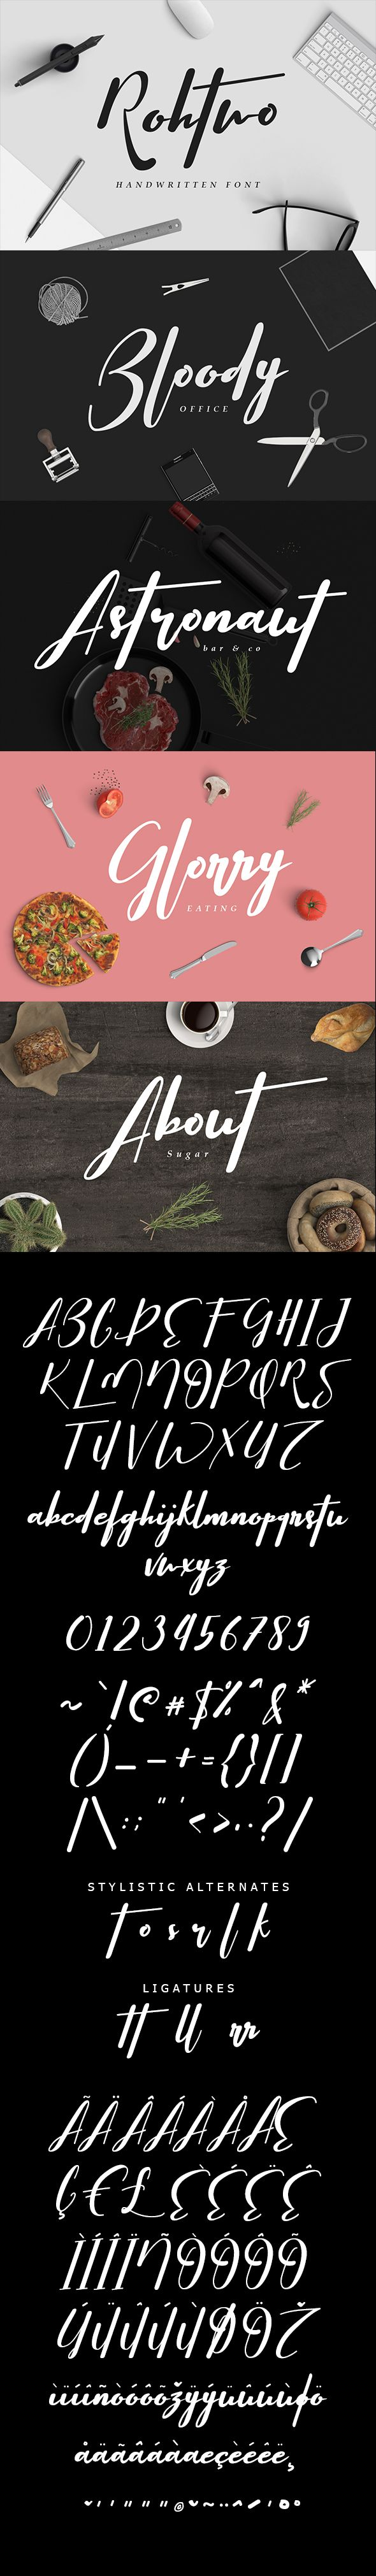 #Rohtwo Bold #Signature - Calligraphy #Script Download here: https://graphicriver.net/item/rohtwo-bold-signature/19751515?ref=alena994